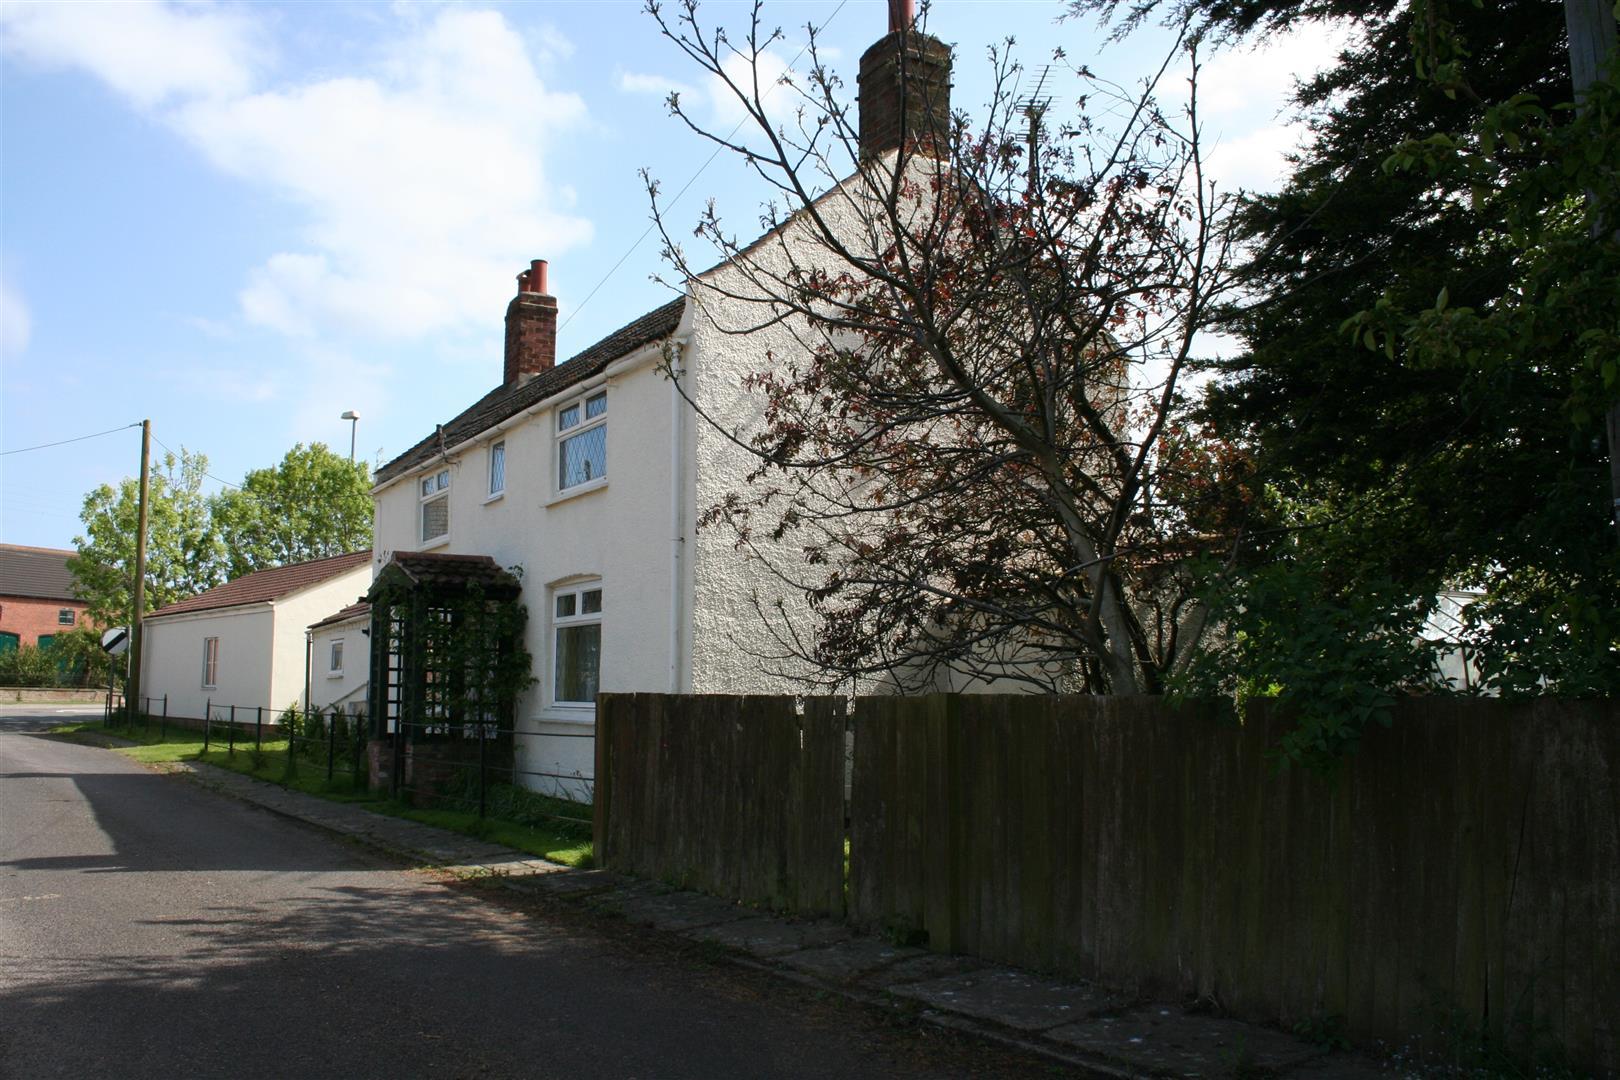 3 bedroom property in Swineshead